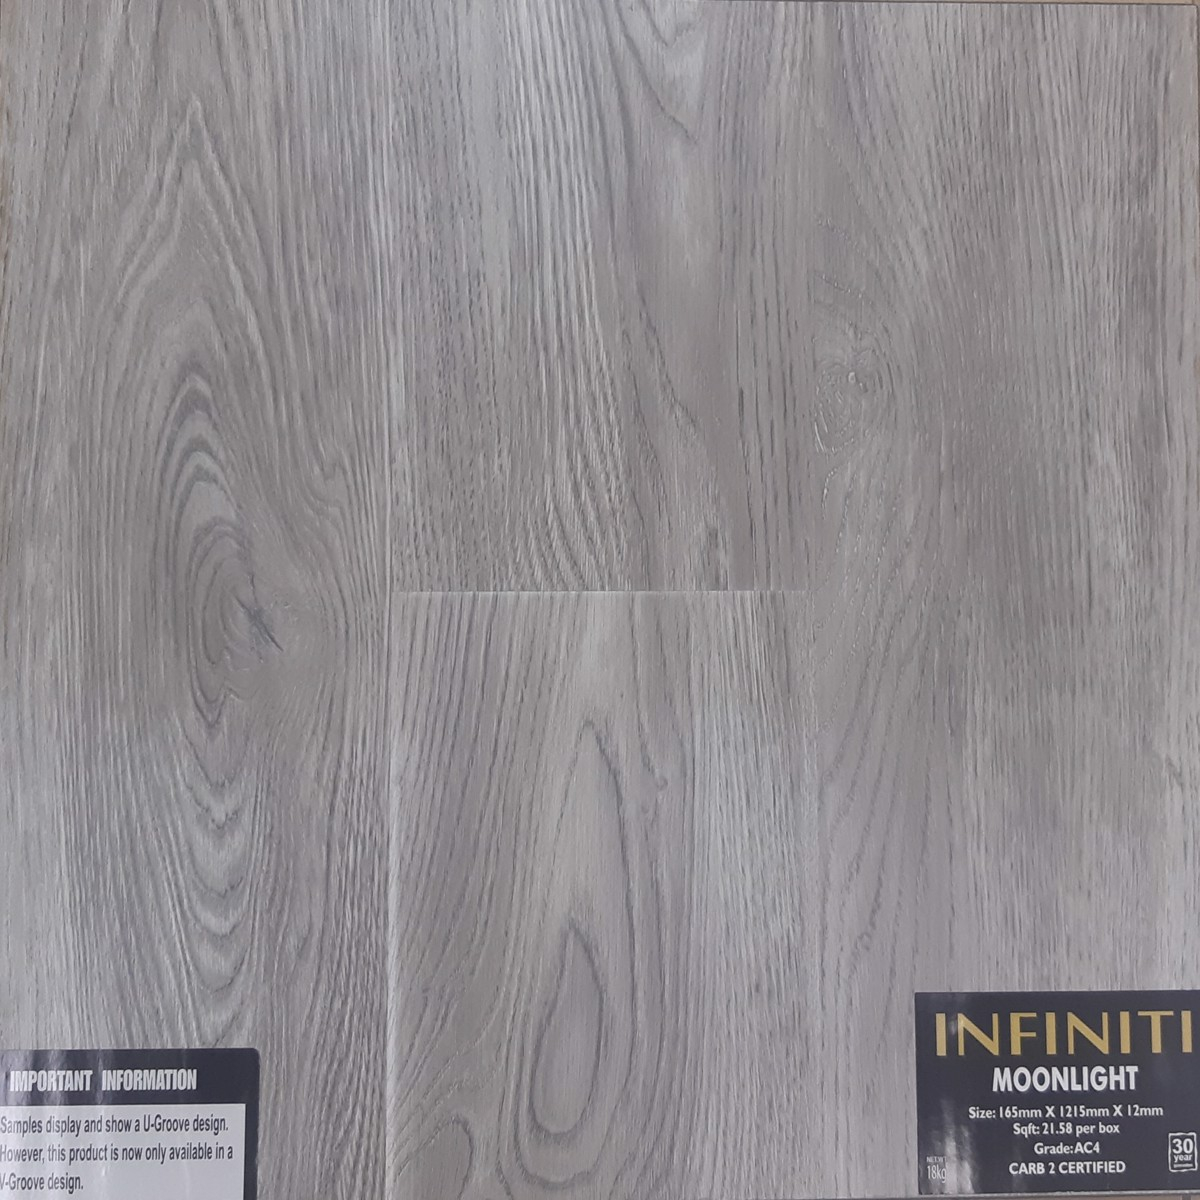 Infiniti Moonlight Laminate Flooring 6, Carb Laminate Flooring